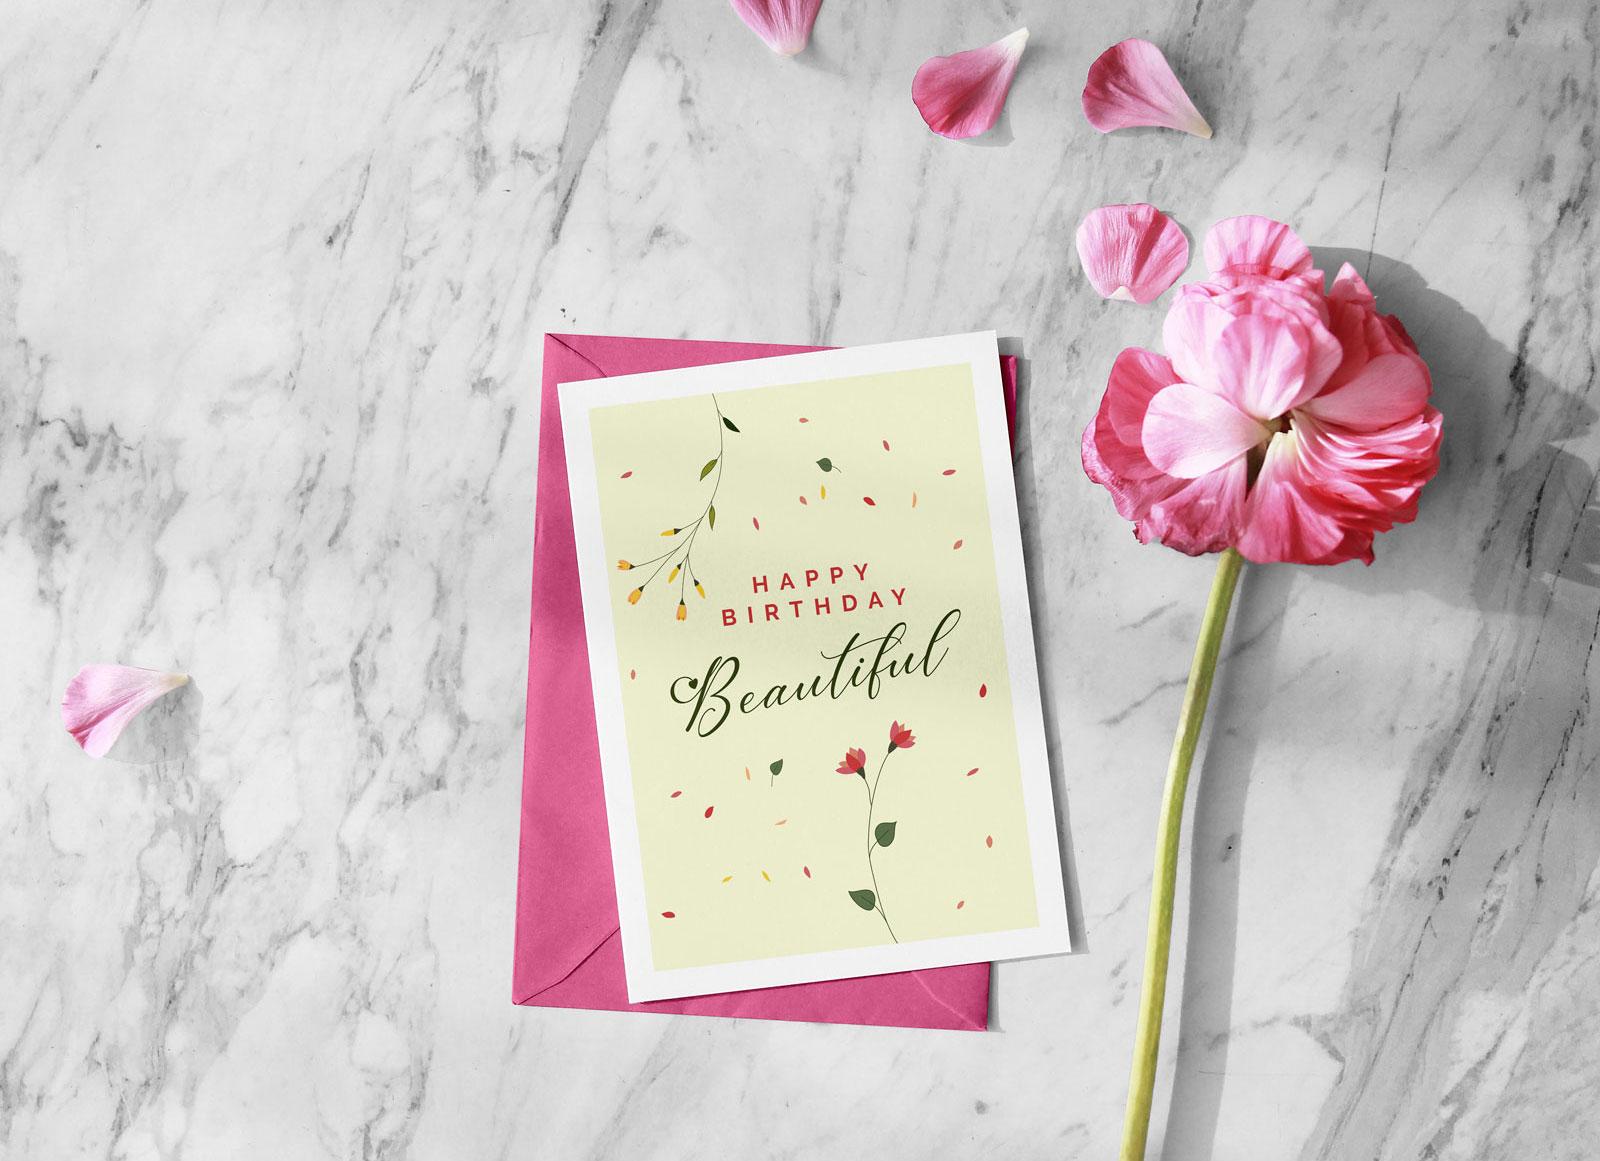 Free-Shadow-Floral-Greeting-Card-Mockup-PSD